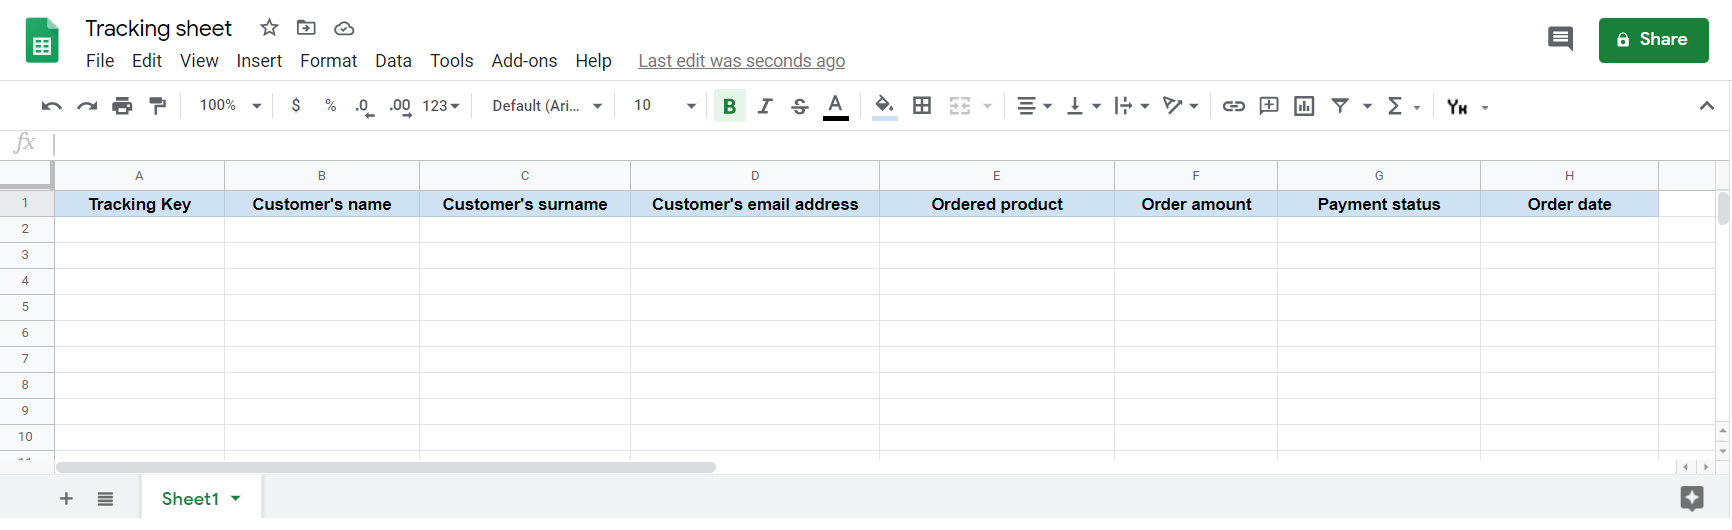 Google Sheet example configuration